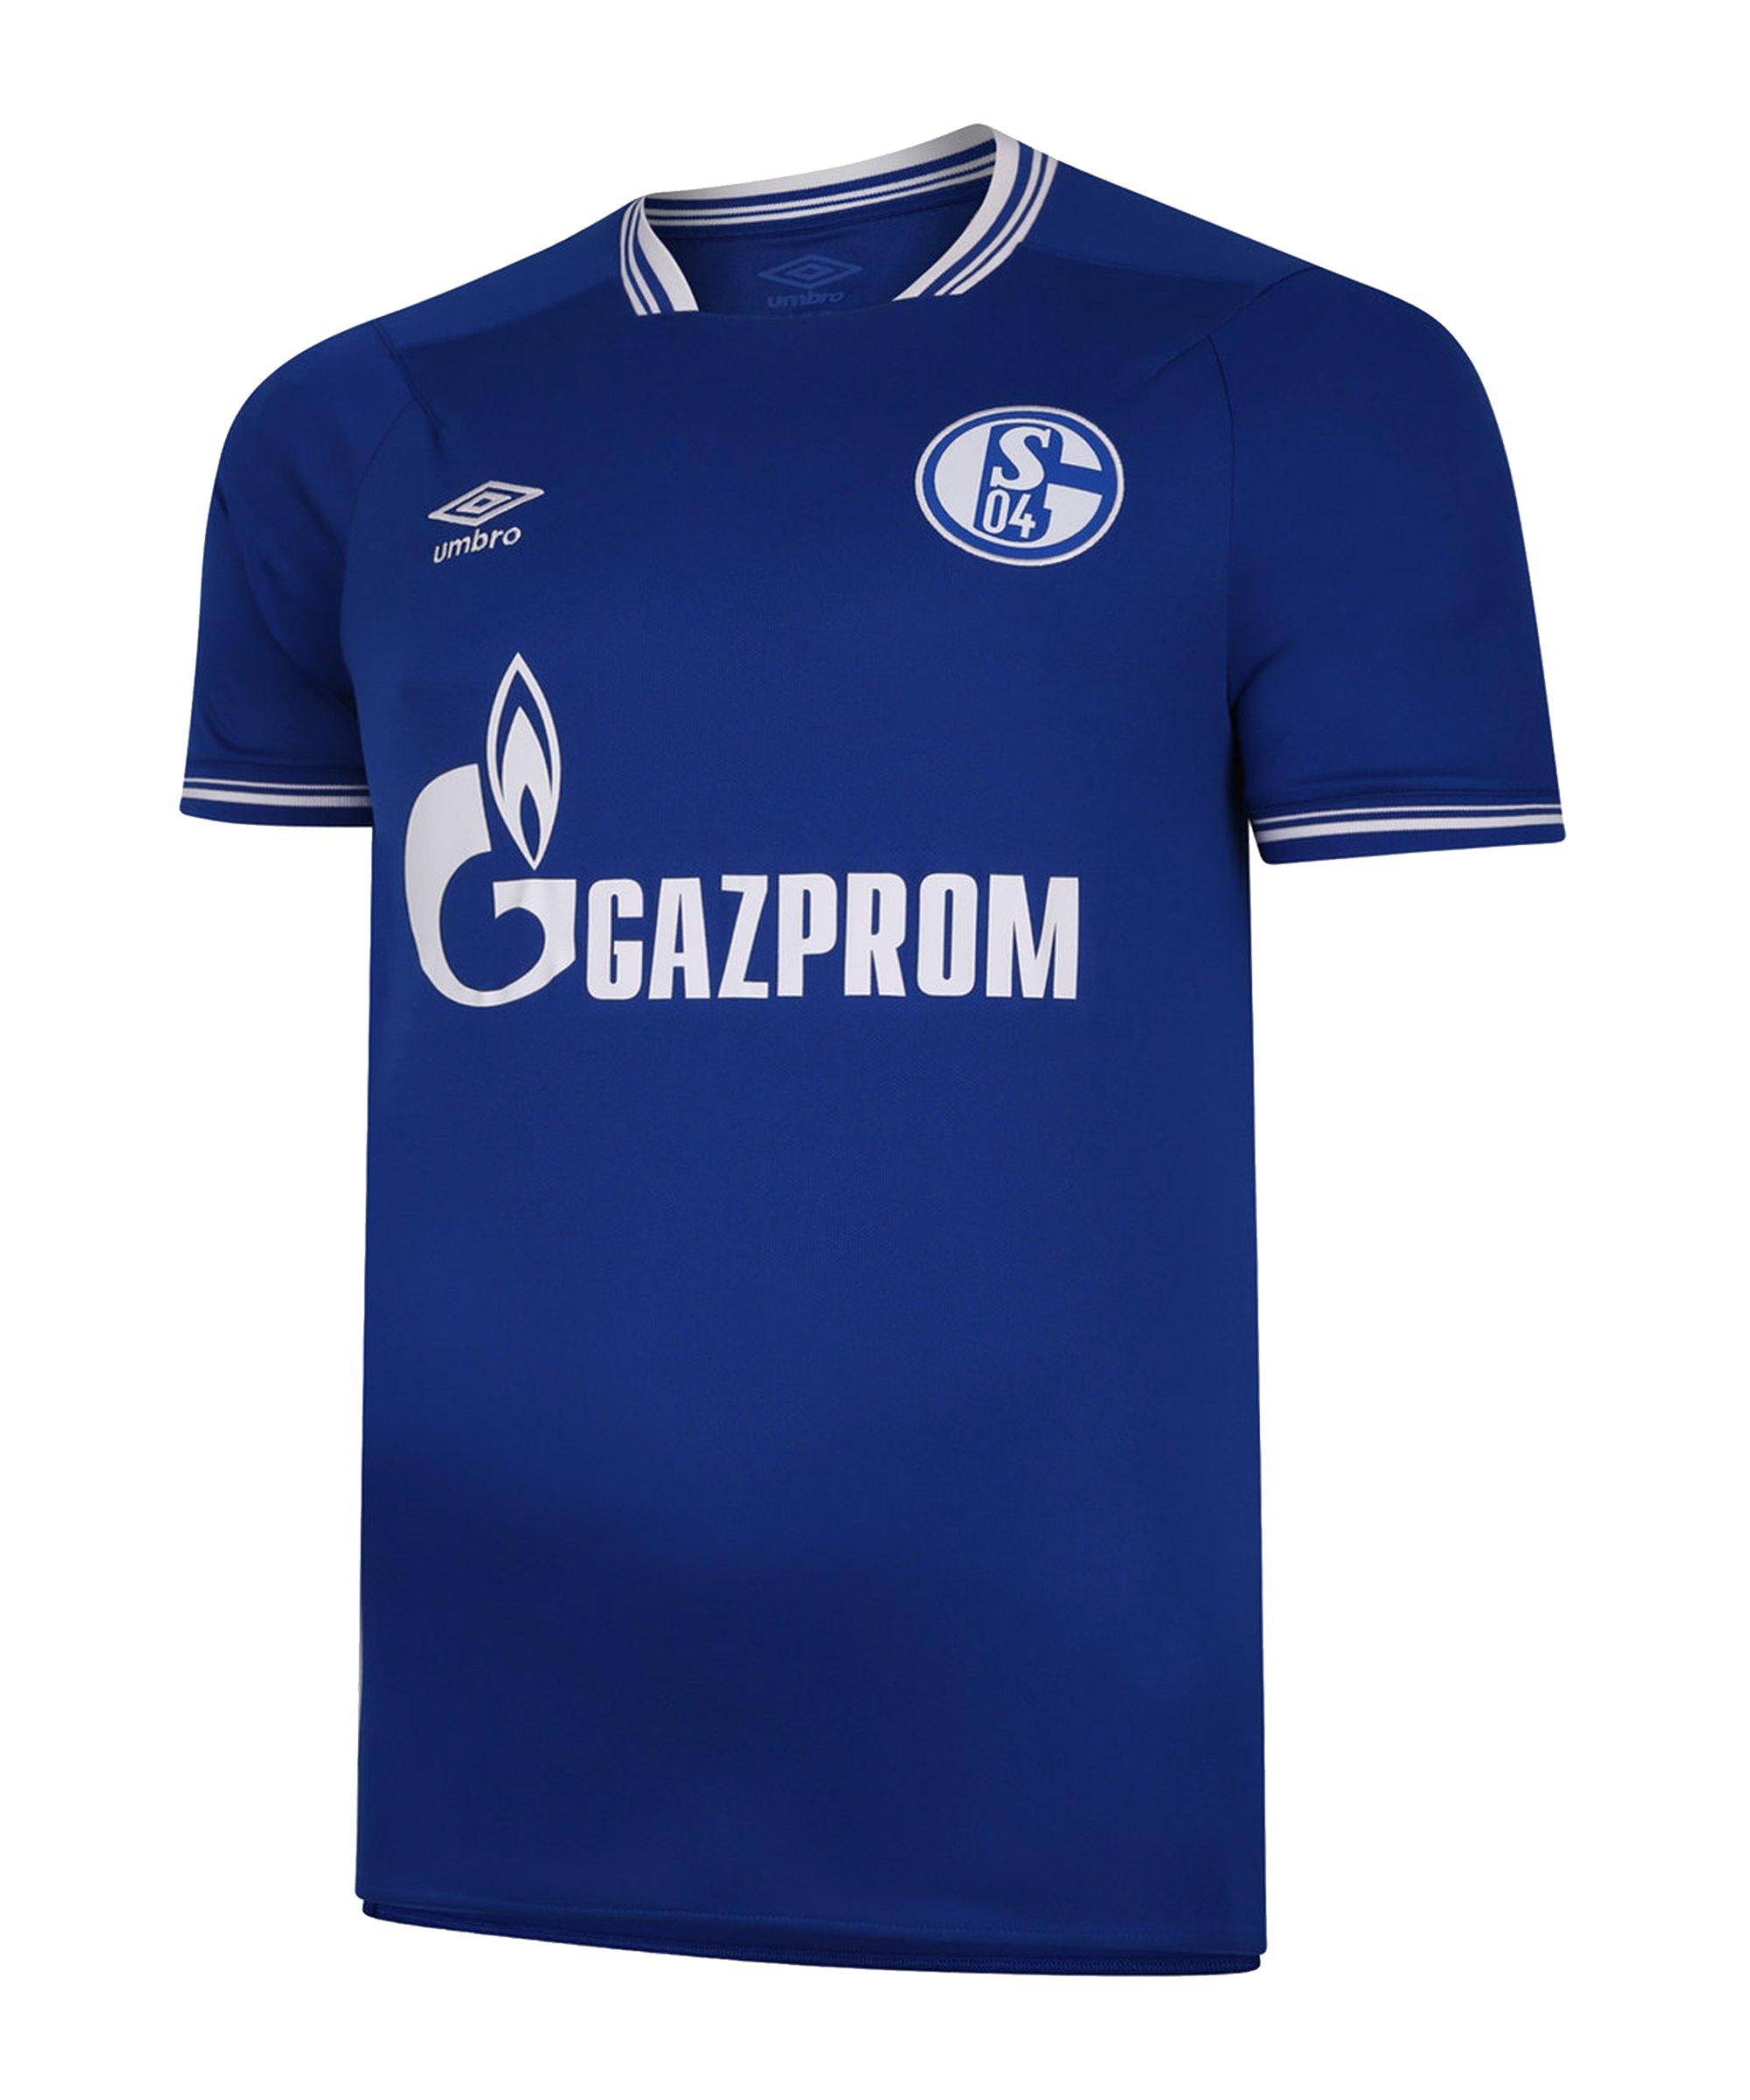 Umbro FC Schalke 04 Trikot Home 2020/2021 Blau FKIT - blau